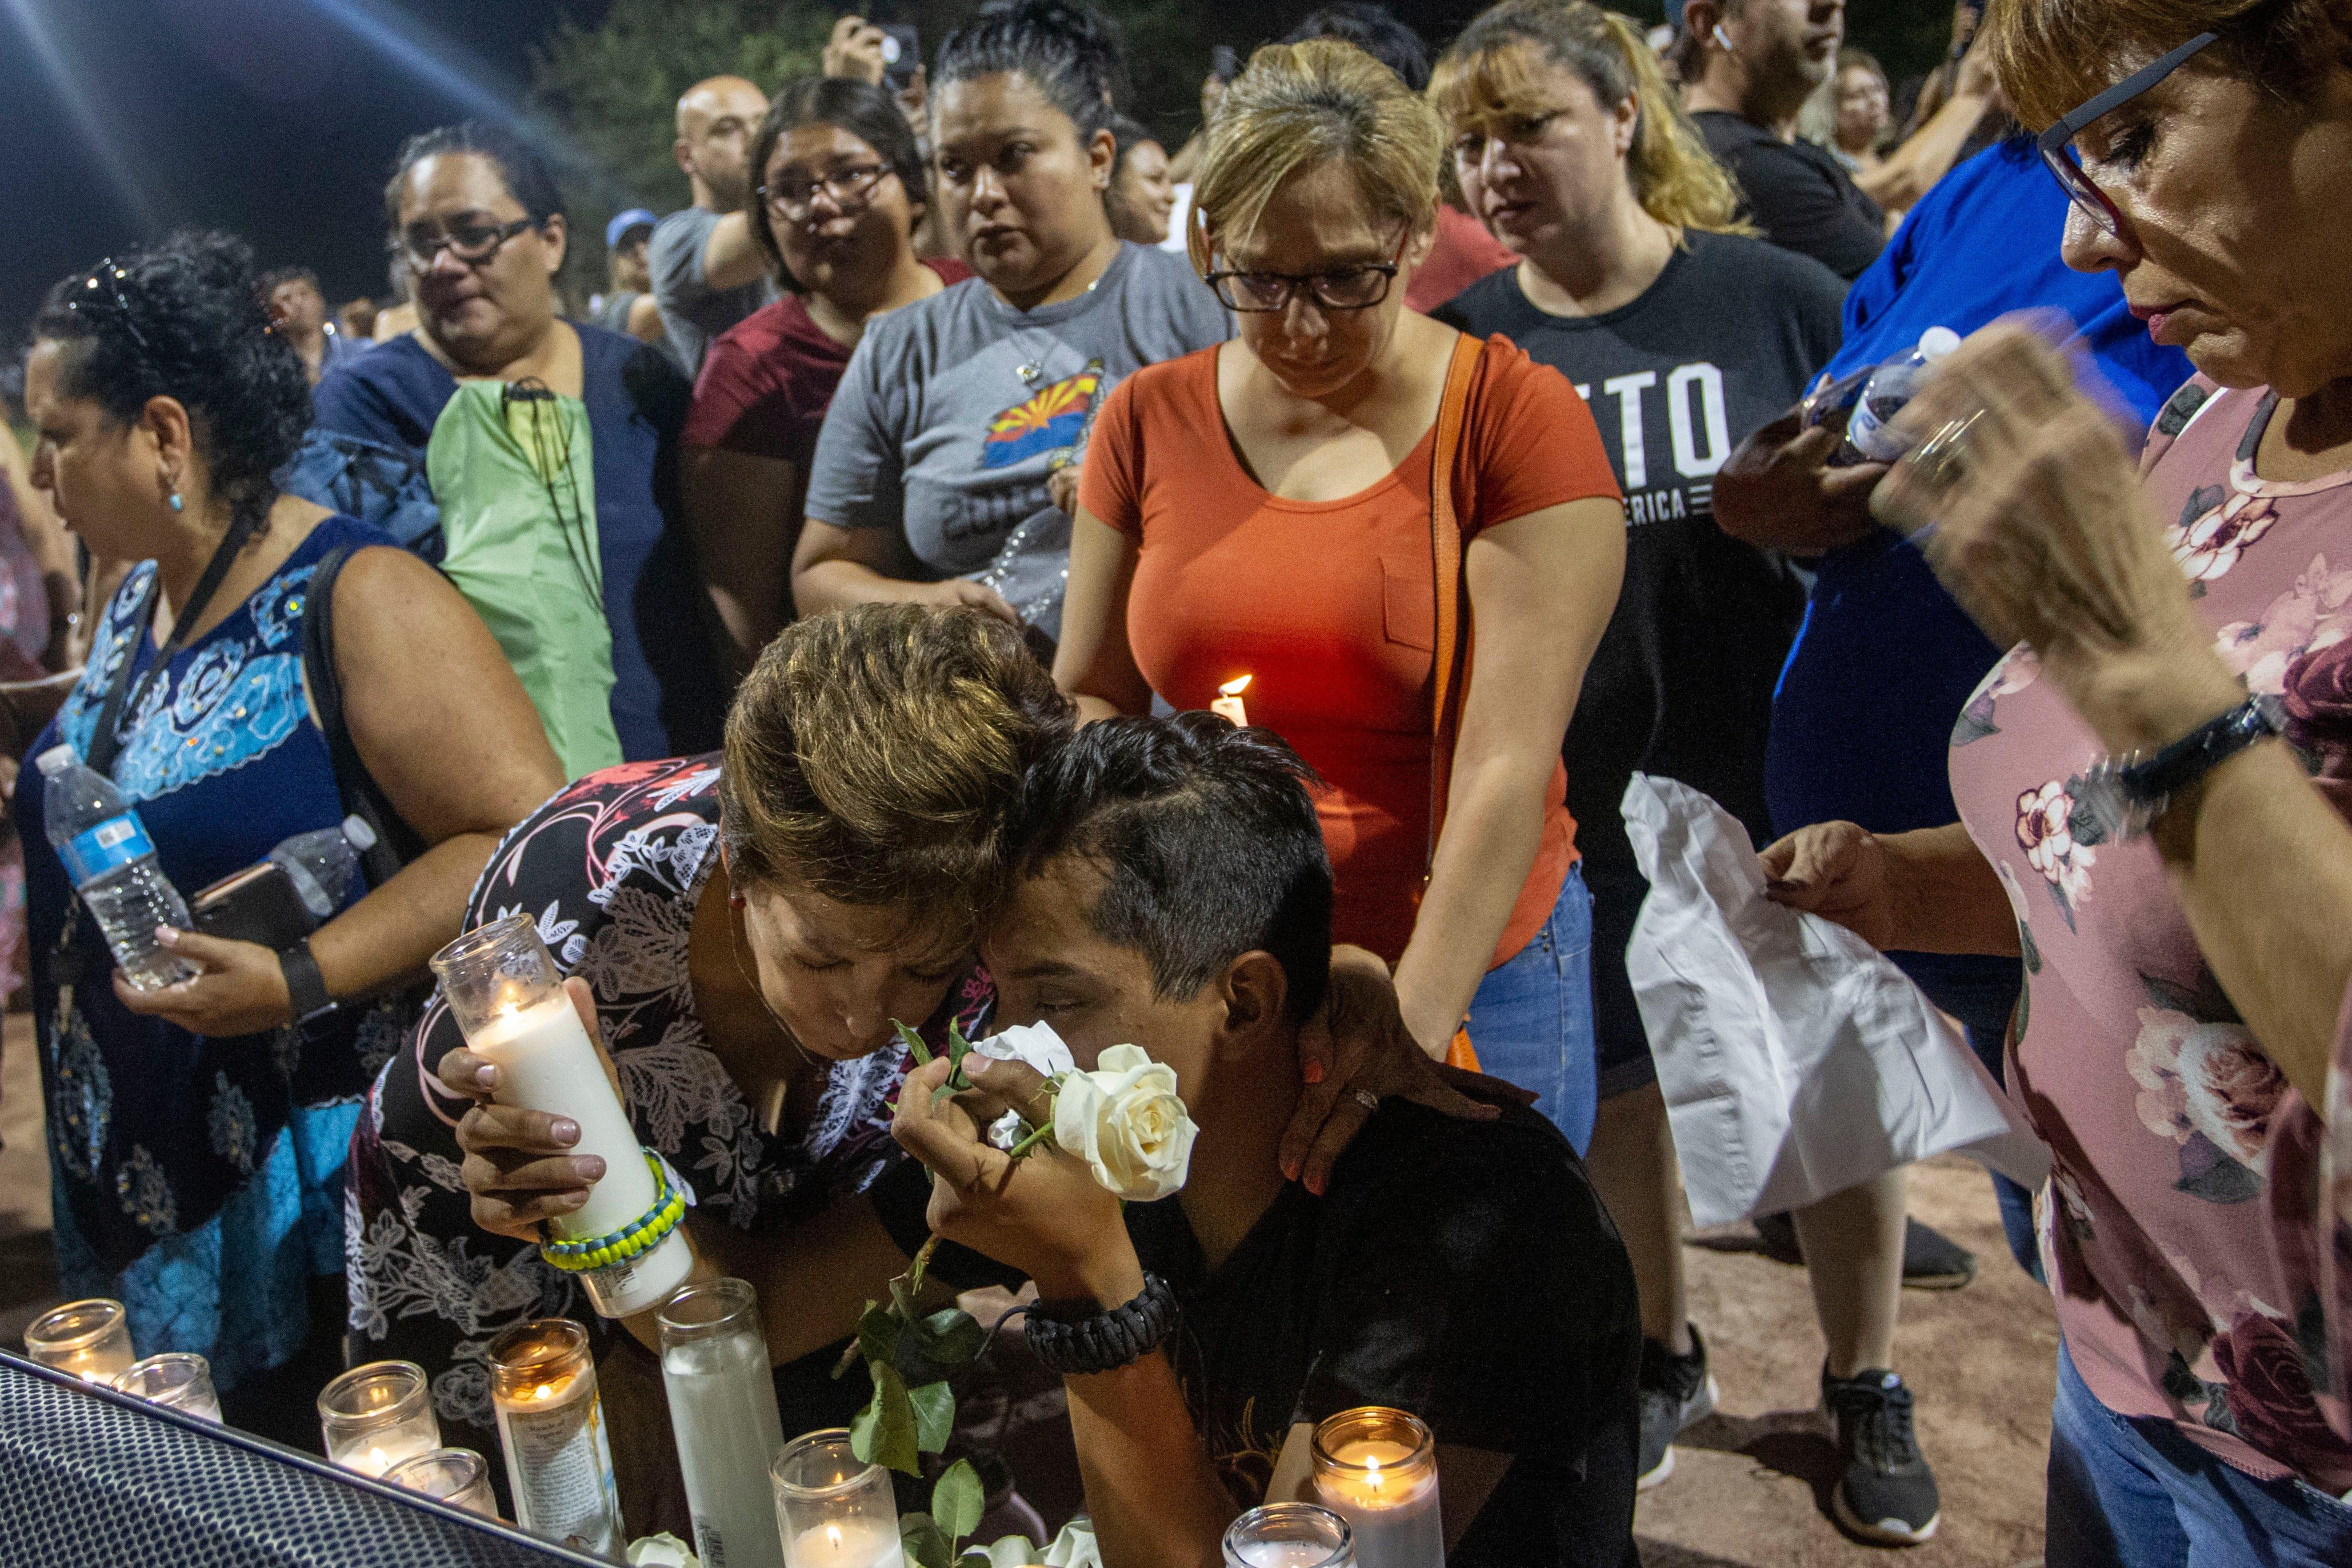 Manuel Diaz mourns the loss of his cousin, Armis Ramirez, 15, during a vigil Sunday, Aug. 4, 2019, at Ponder Park in El Paso.